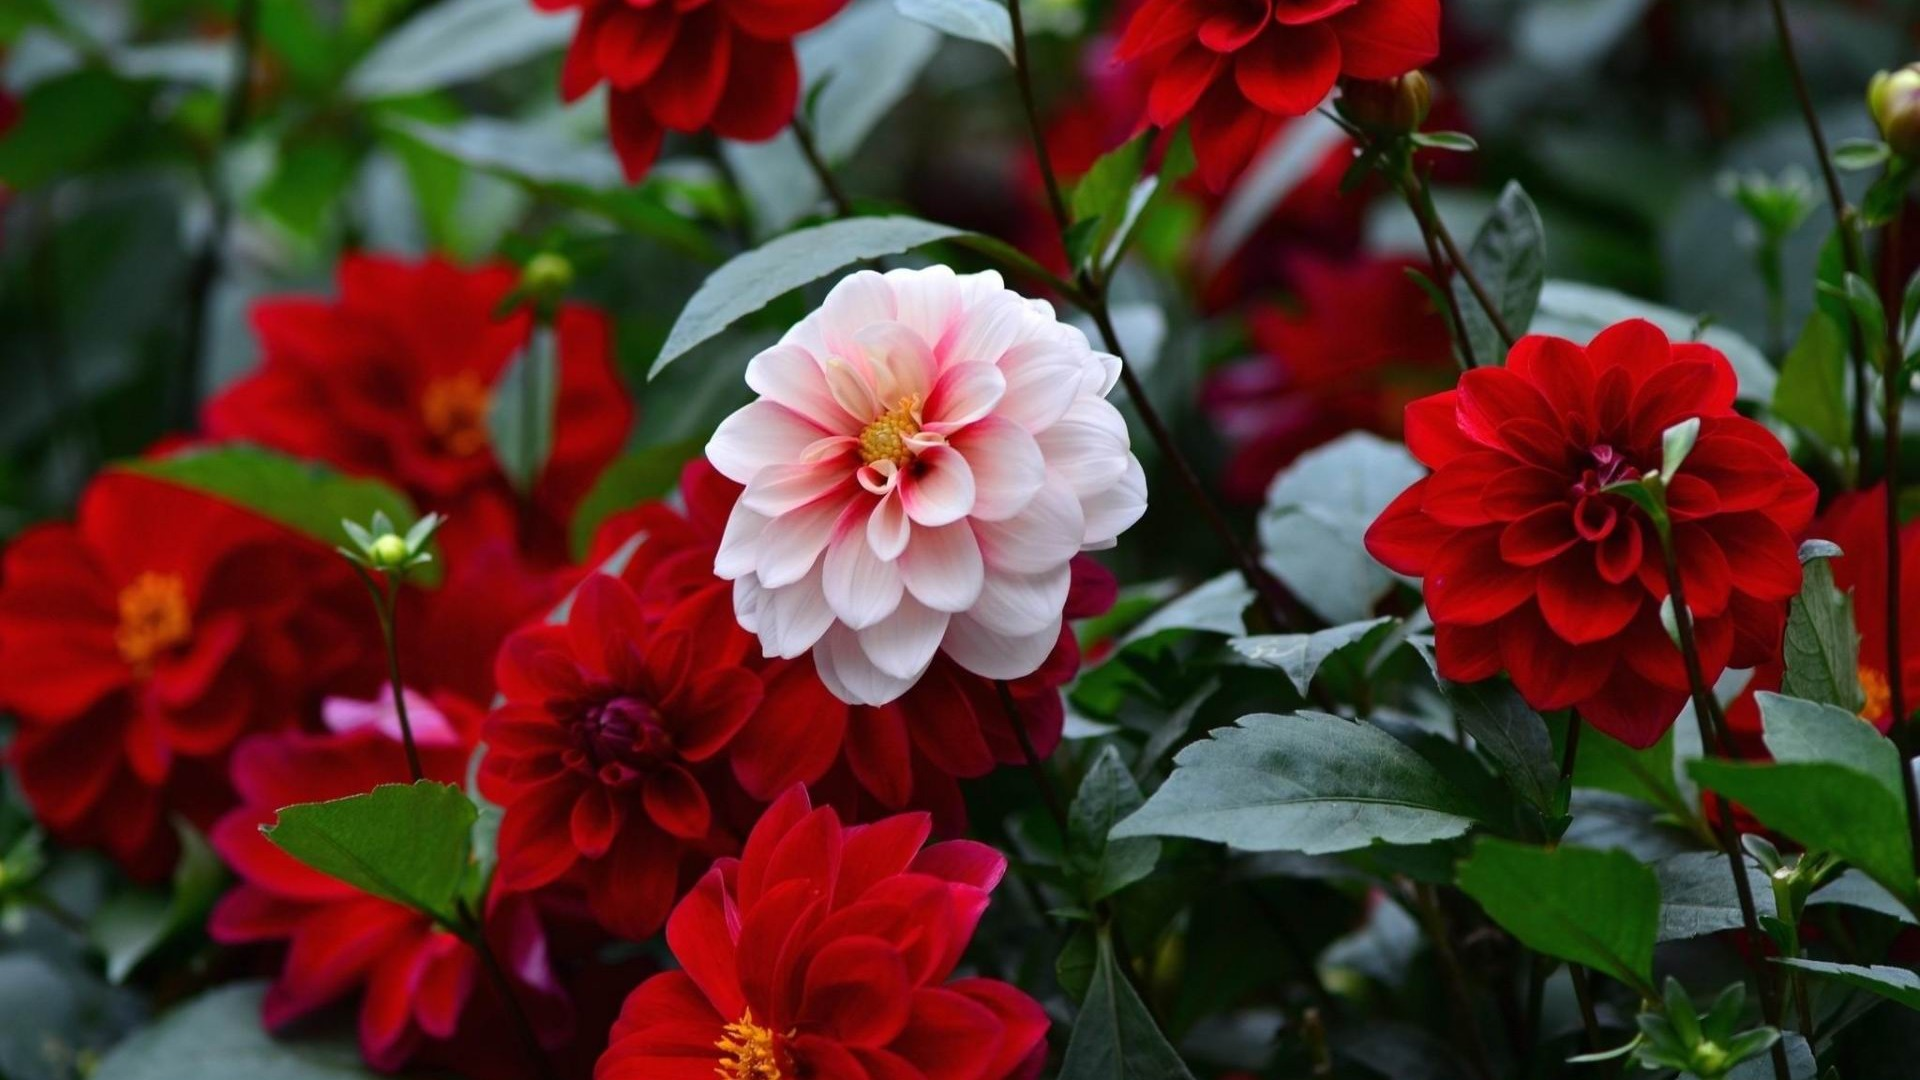 dahlias sharpnessflower photography hd wallpaper preview